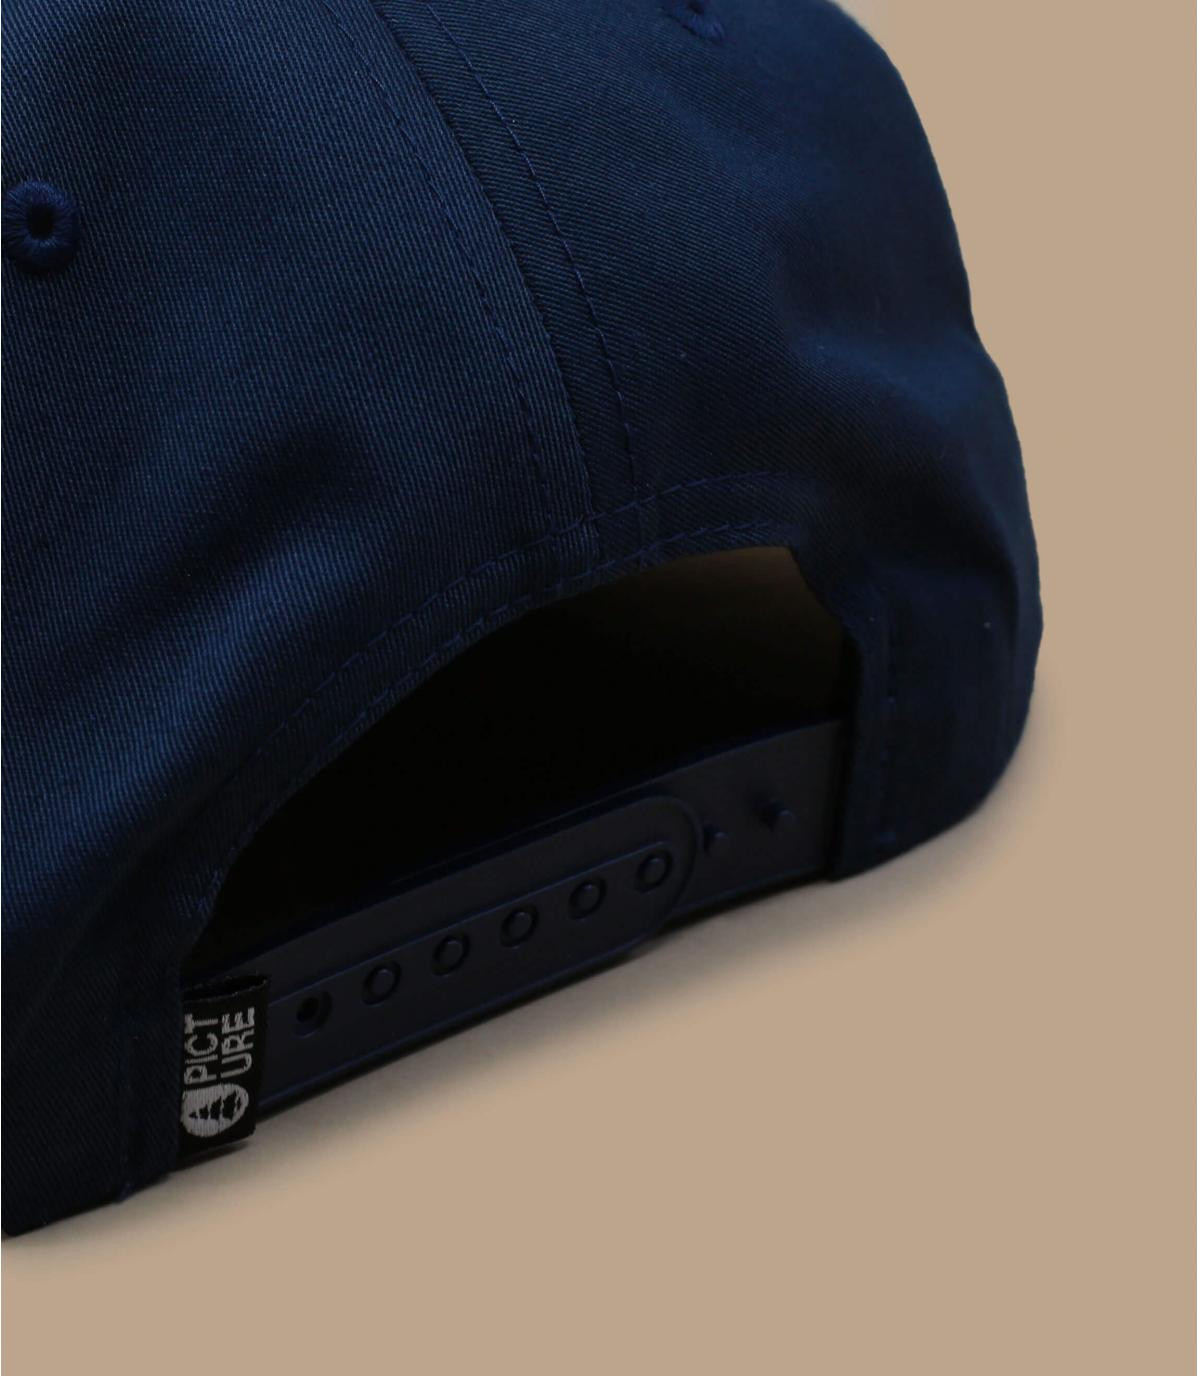 Détails Narrow dark blue - image 4